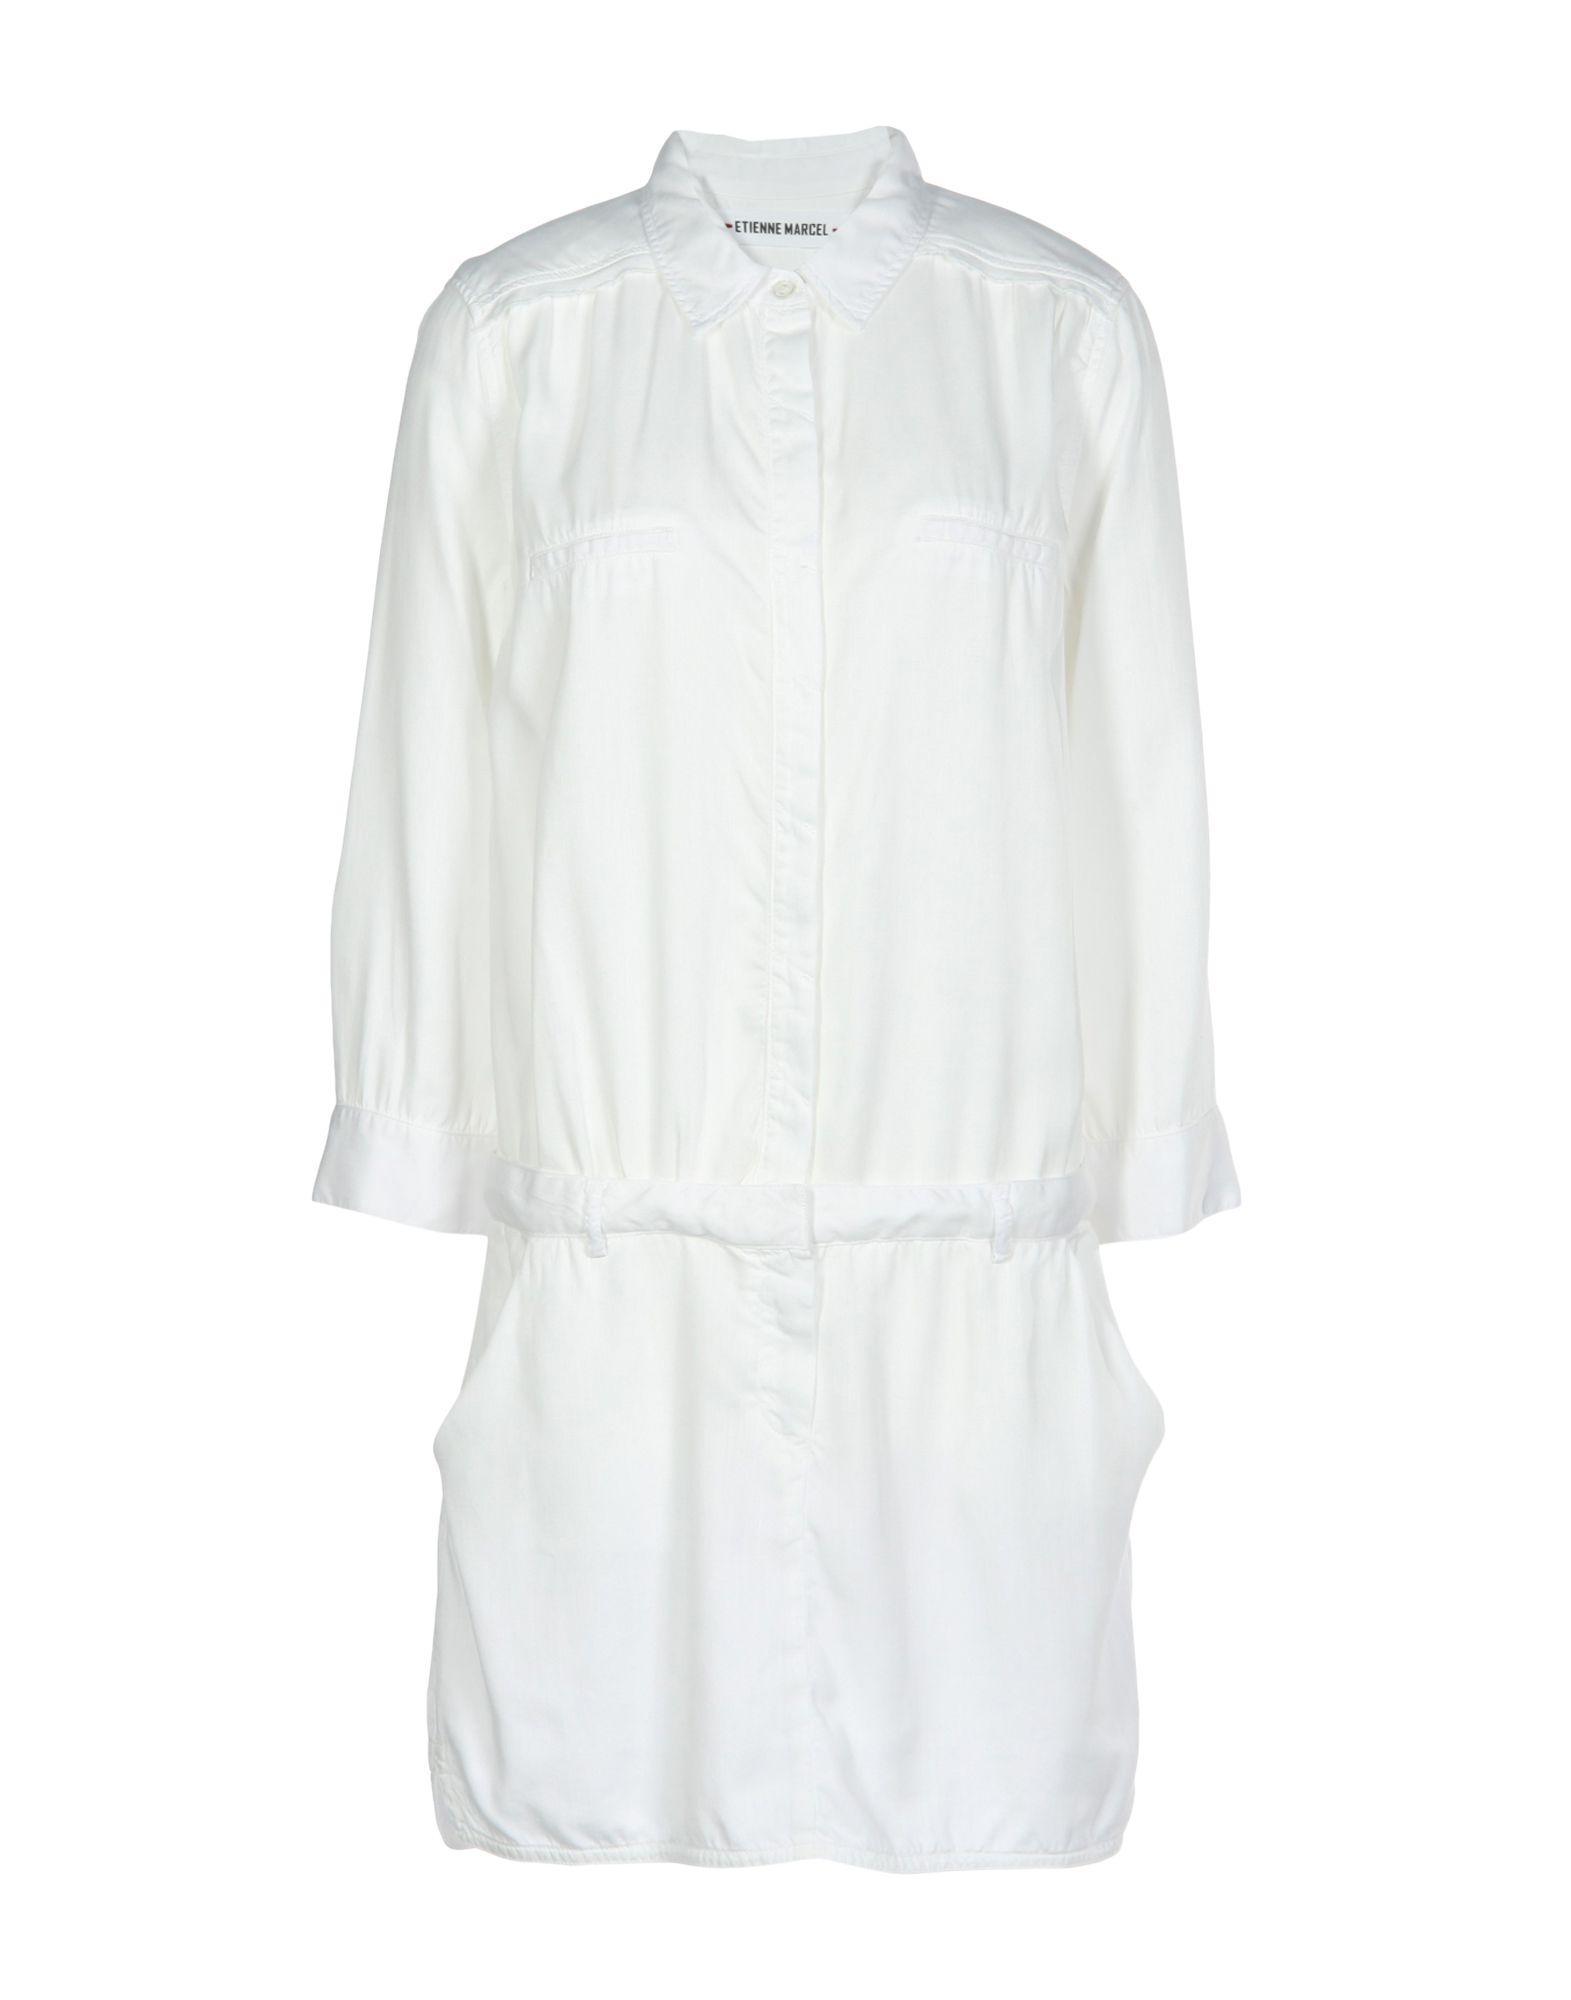 Etienne Marcel Short Dress In White